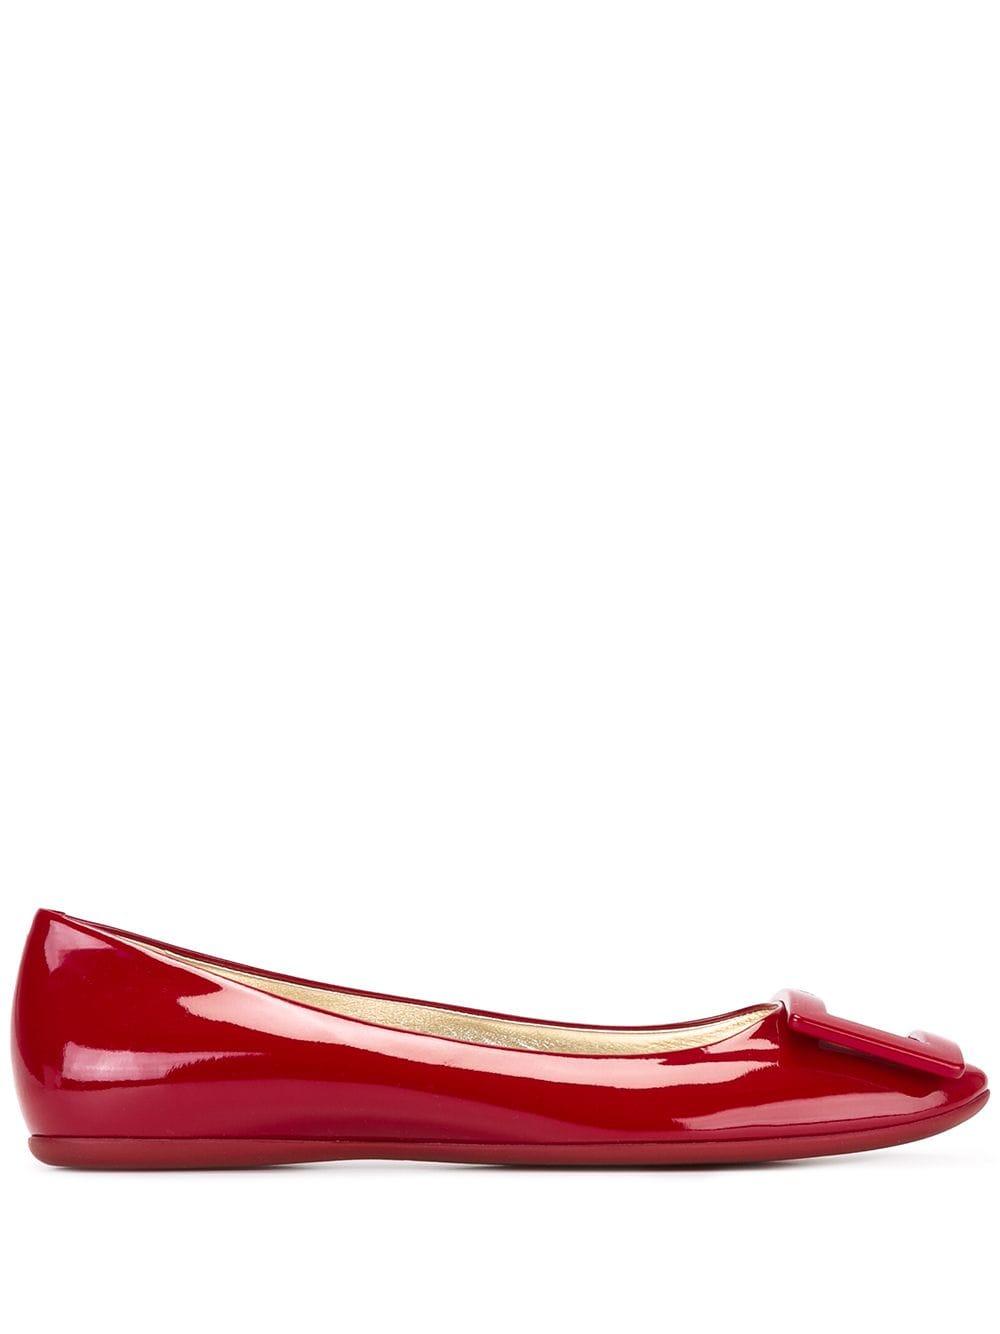 Gommette Patent Leather Ballet Flats